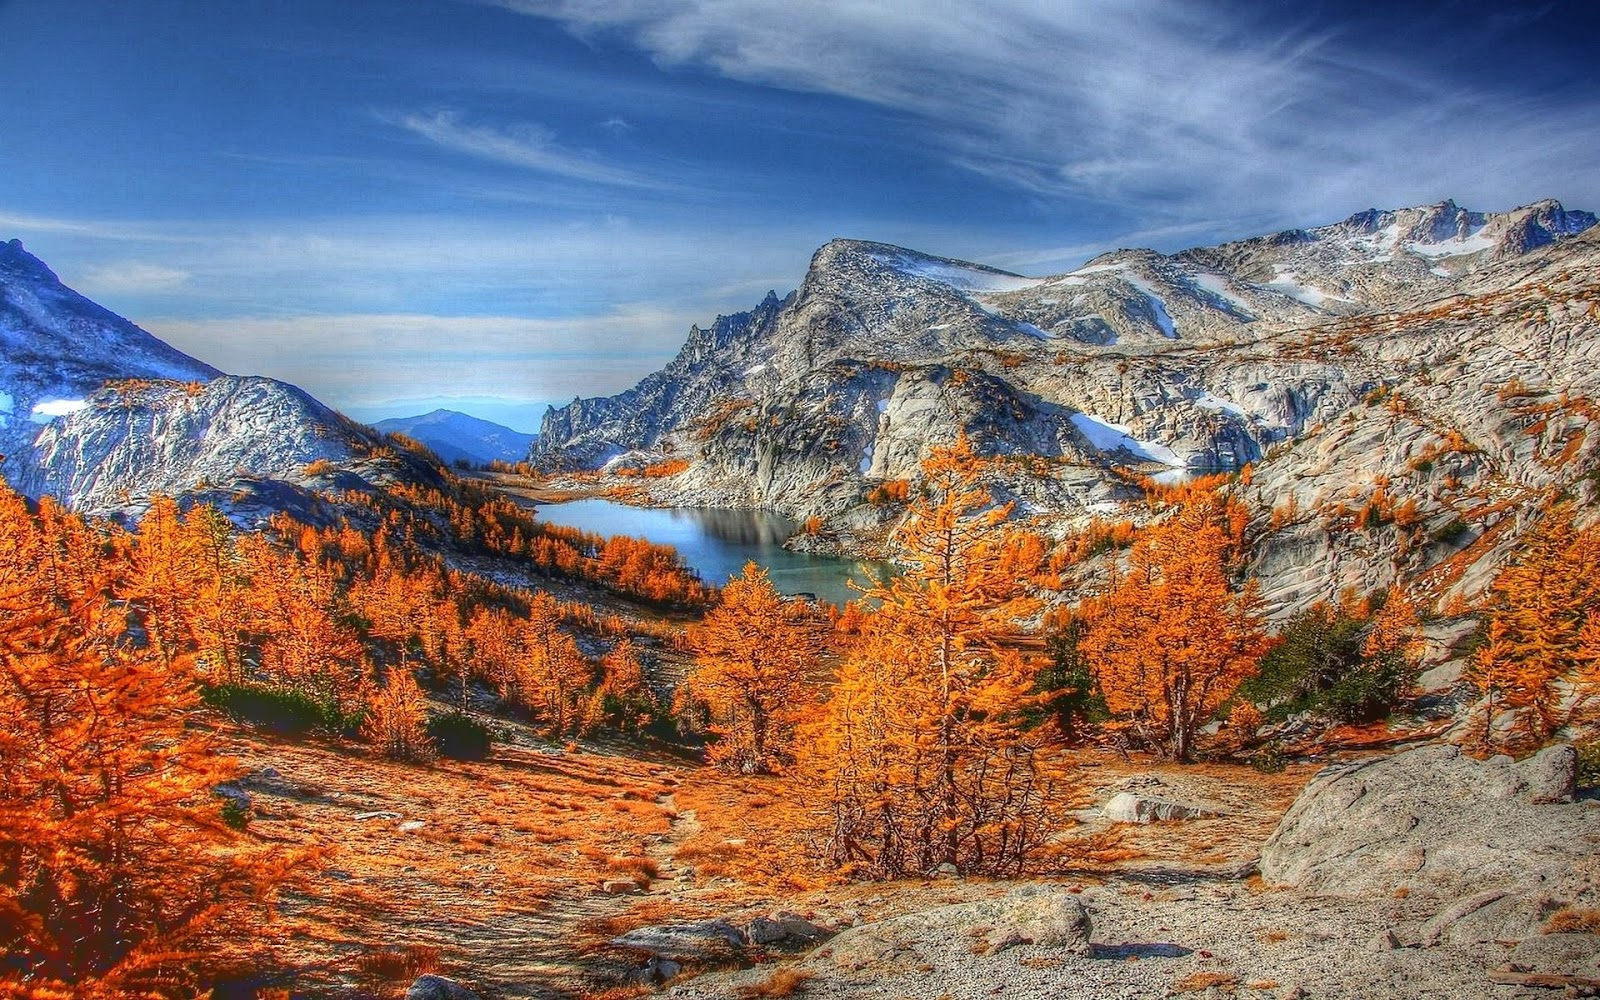 http://1.bp.blogspot.com/--CHFUyWEbkY/T47EBC2zd9I/AAAAAAAADTE/7MZqOoLLmys/s1600/hdr-mountain-fall-colors-windows-8-wallpaper-1920x1200.jpg